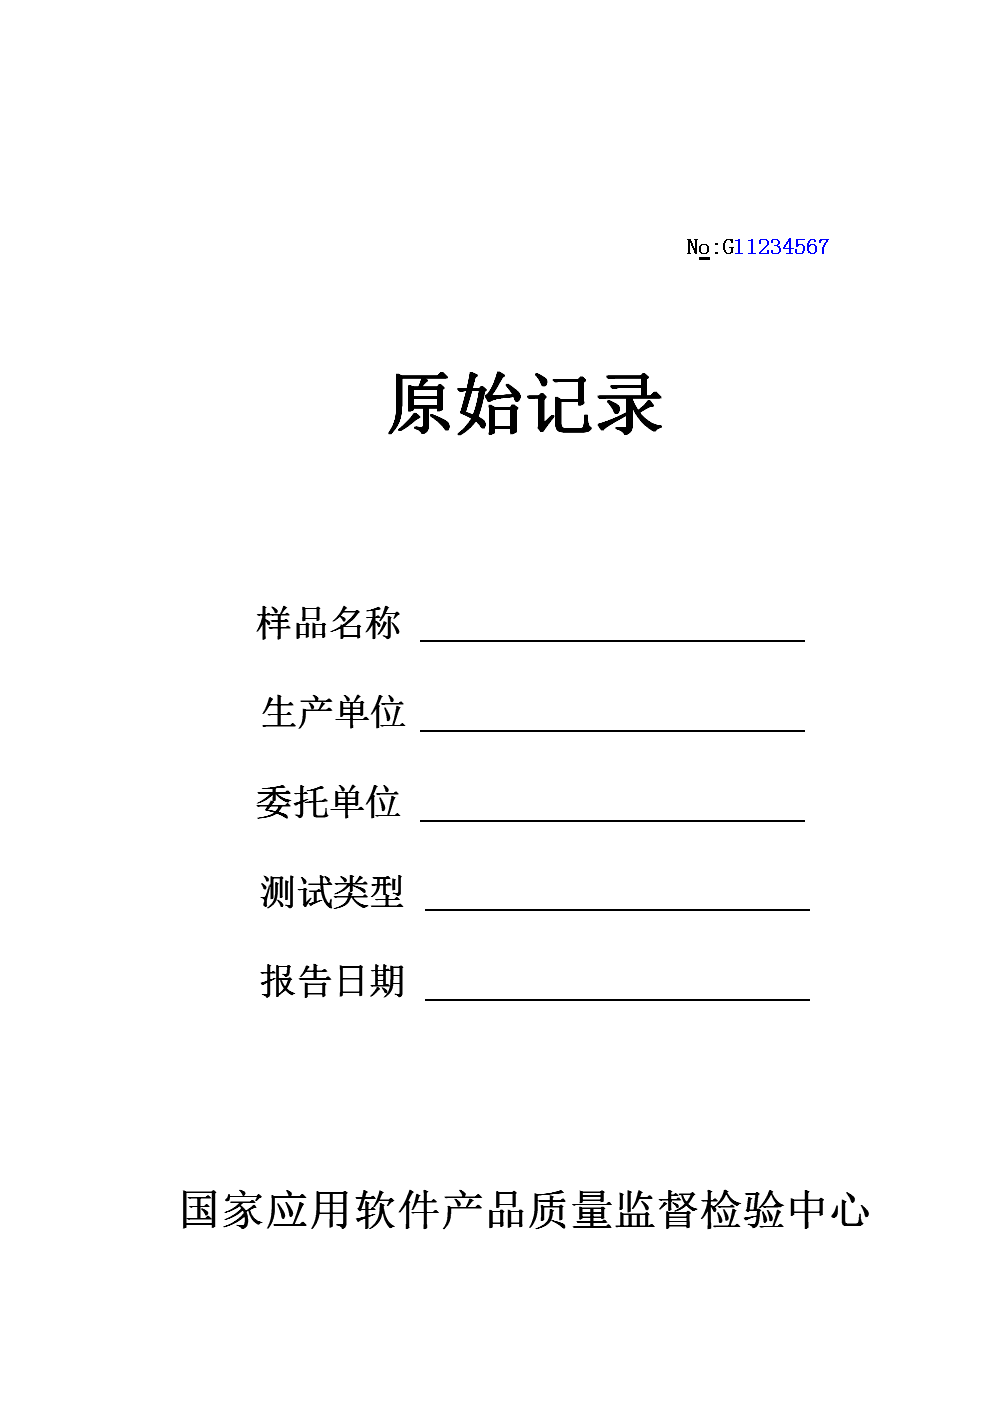 JW06M18原始记录模板.doc